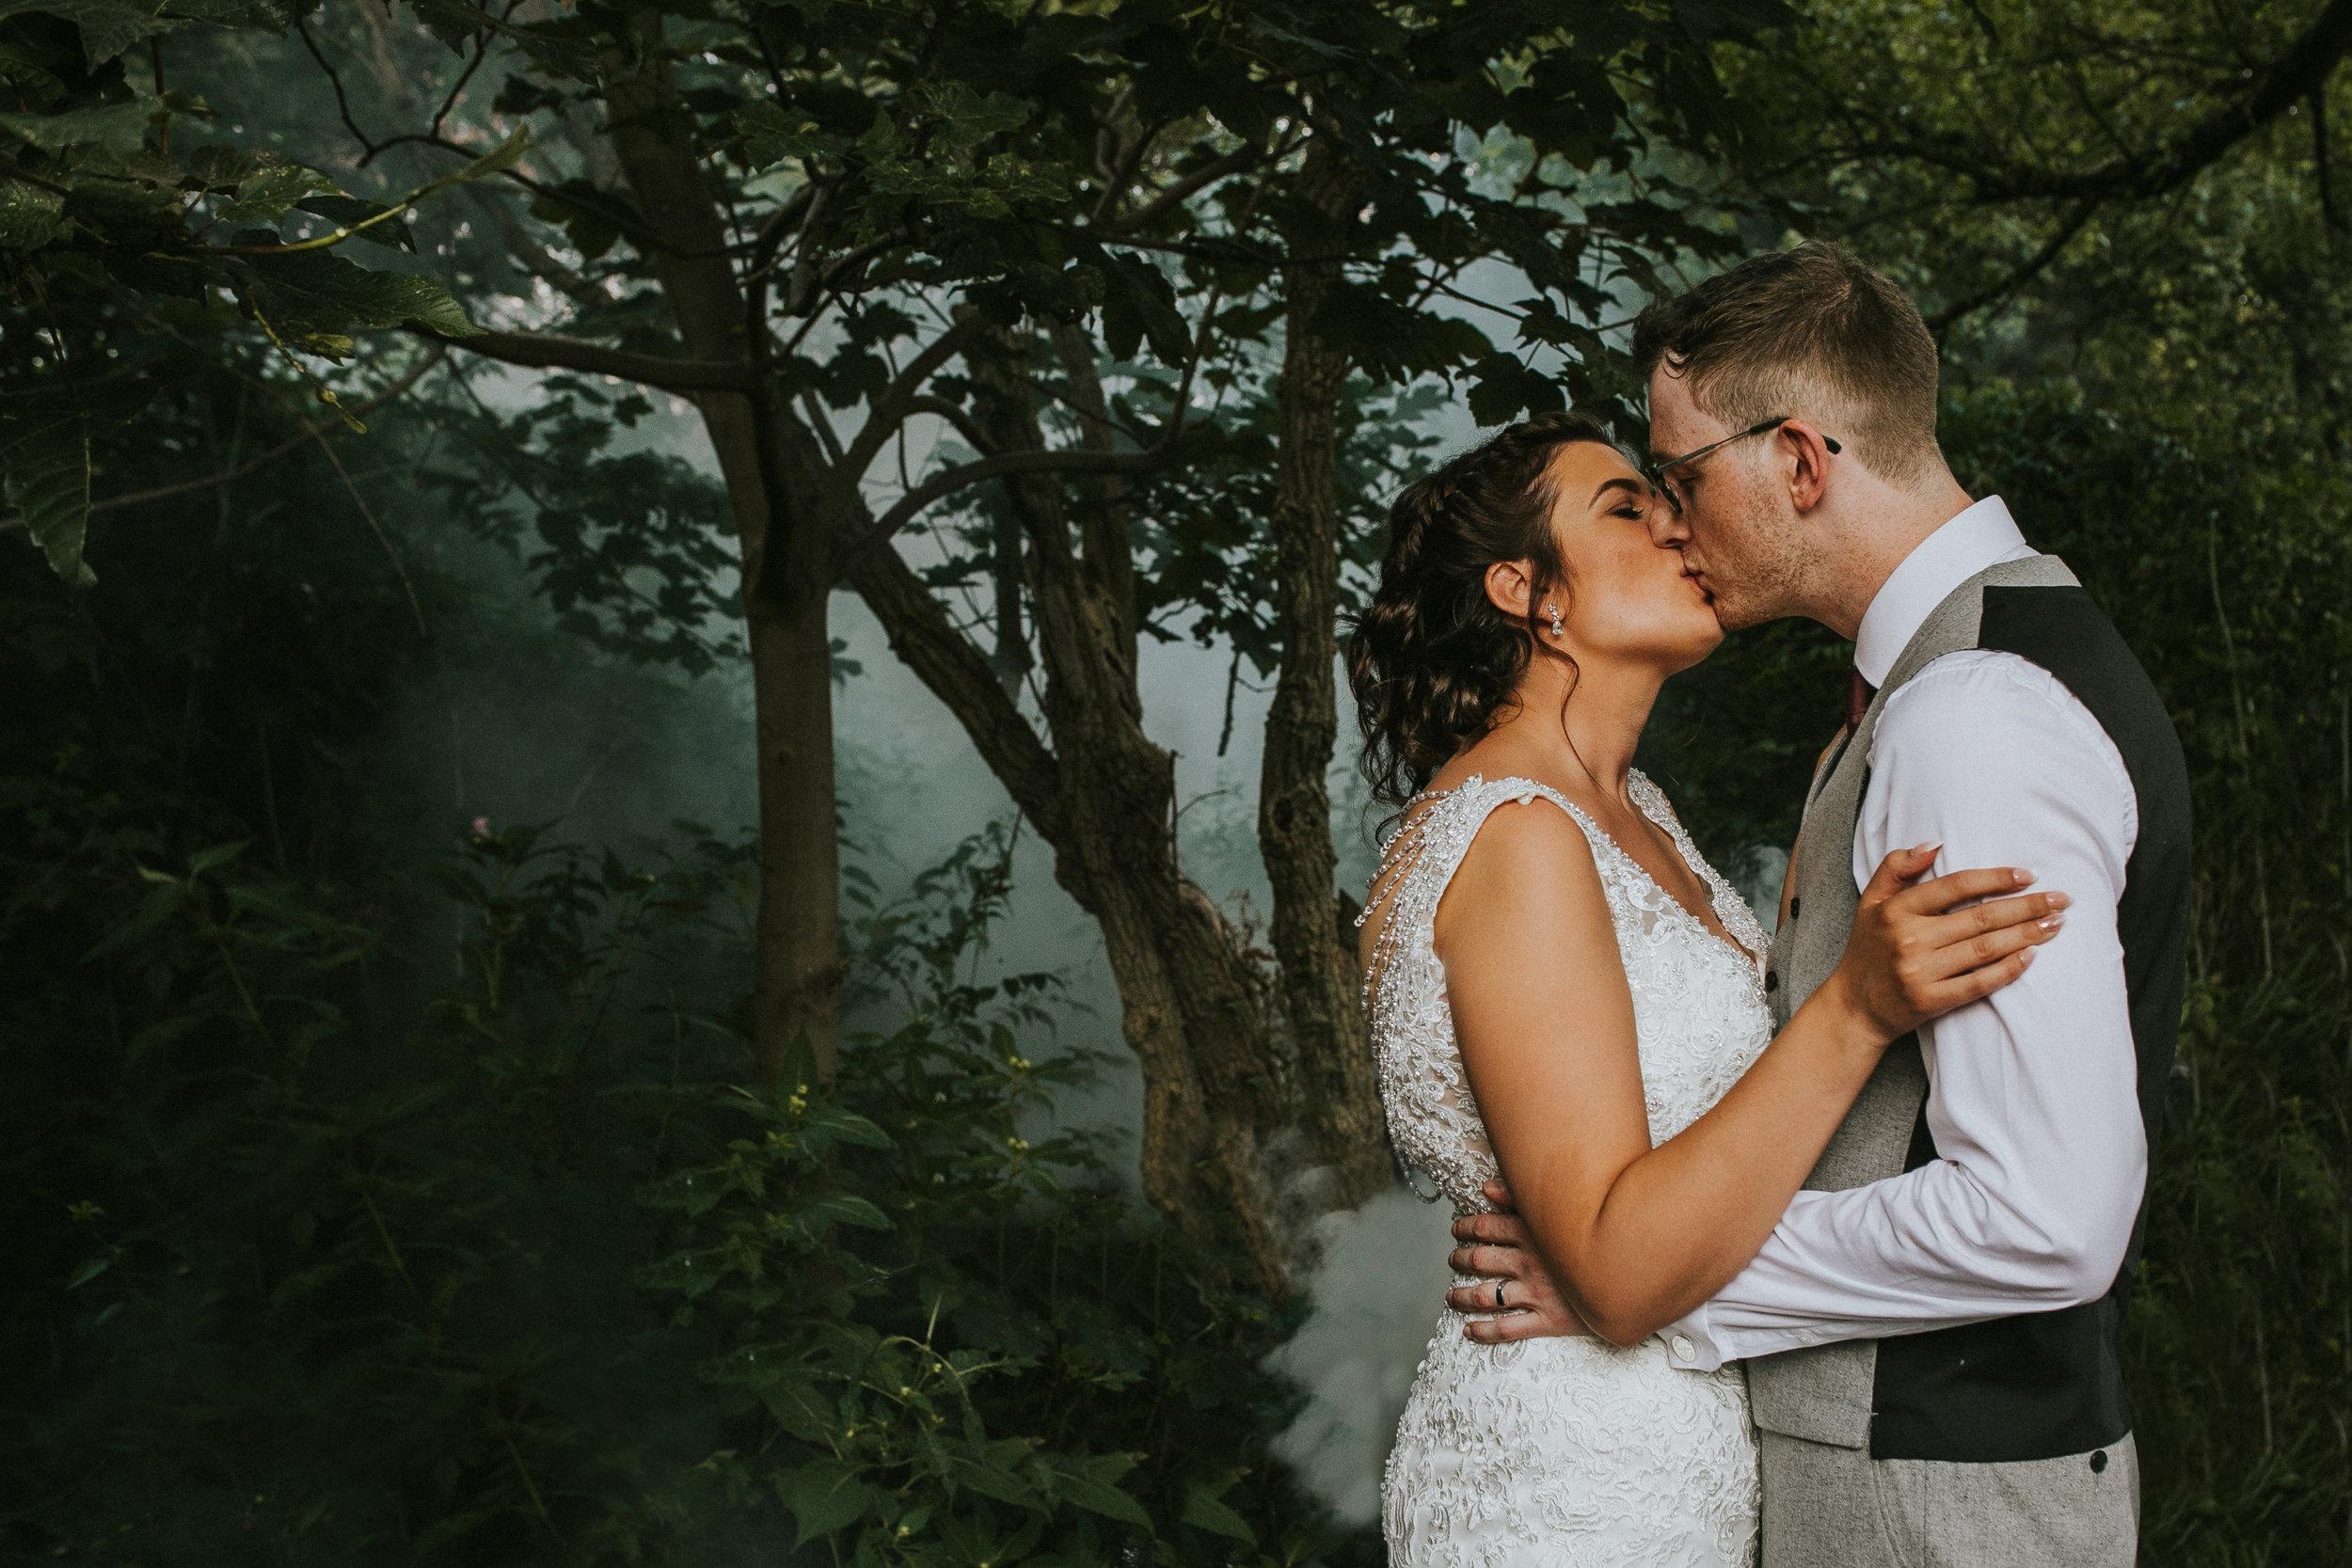 The old grammar school wedding photography